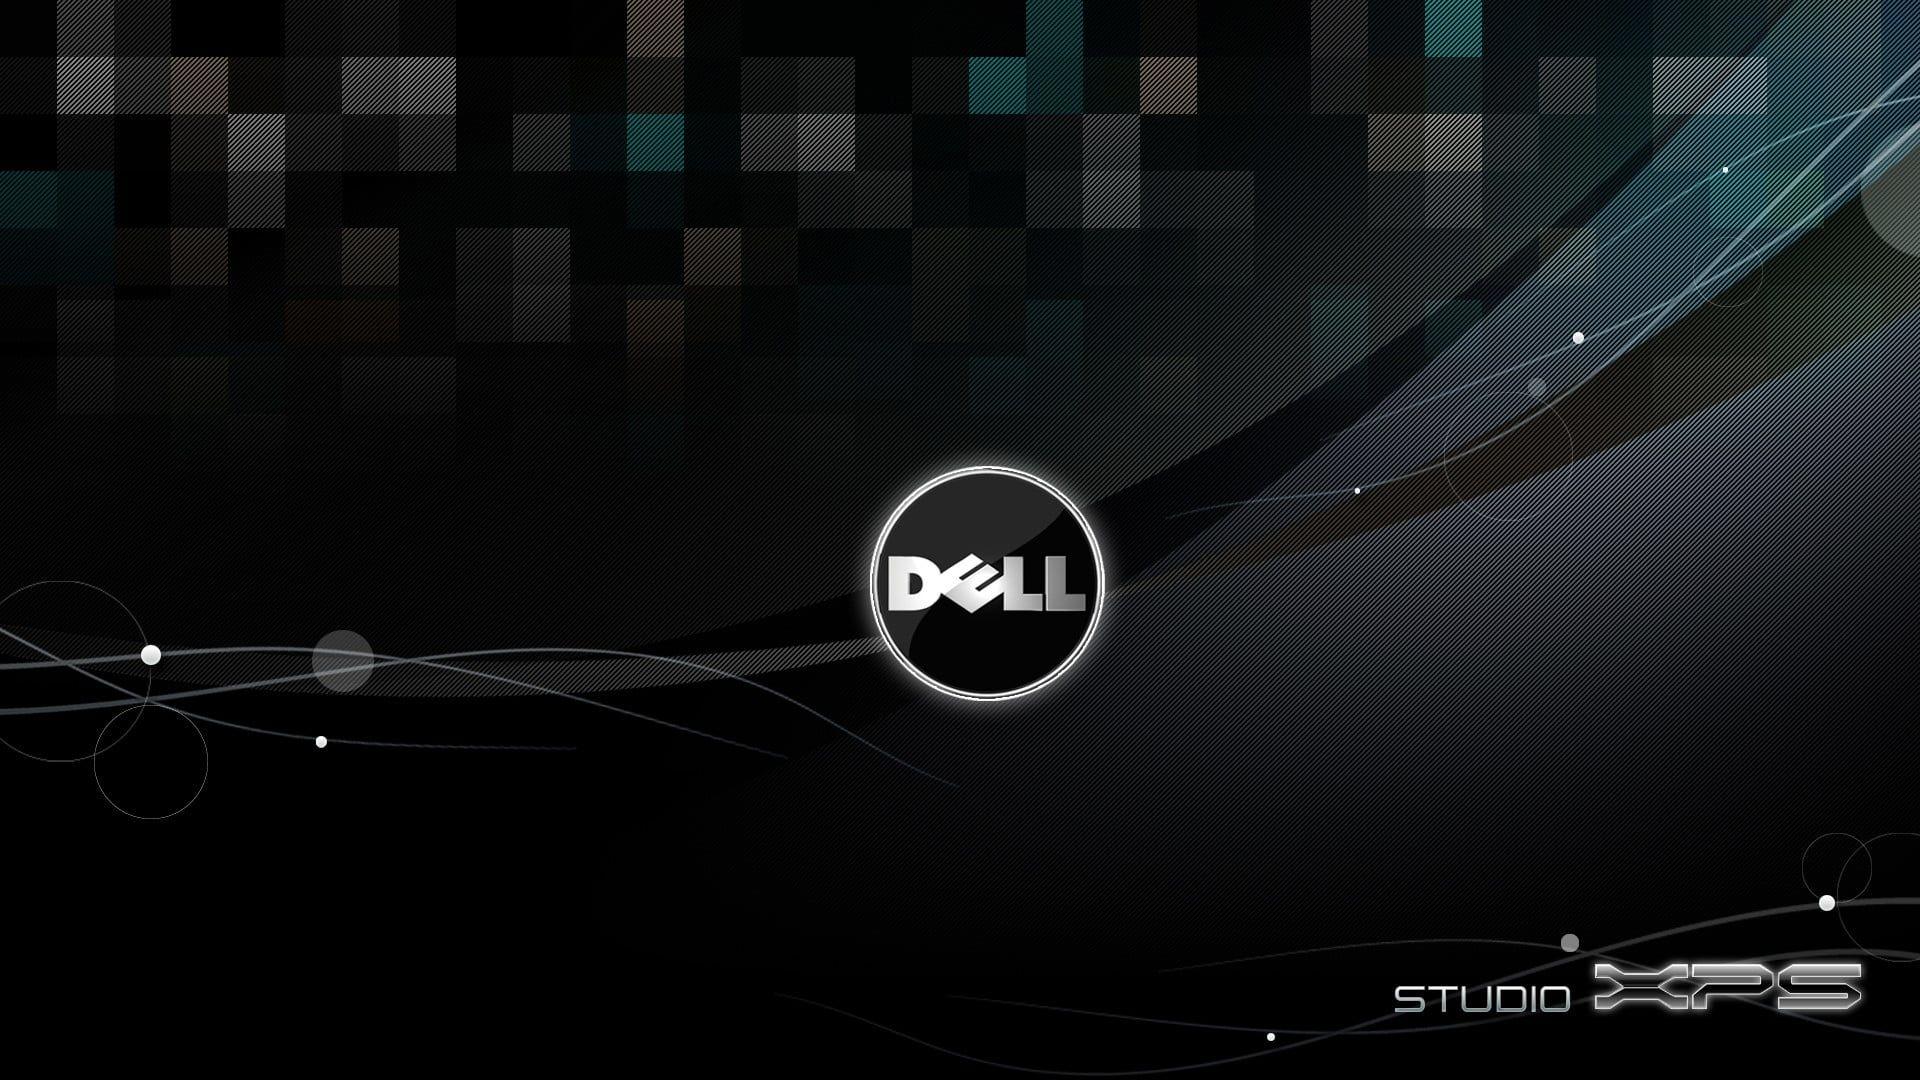 Black Dell Studio Xps Digital Wallpaper Dell Computer Hardware 1080p Wallpaper Hdw In 2020 Computer Wallpaper Desktop Wallpapers Microsoft Wallpaper Dell Desktop